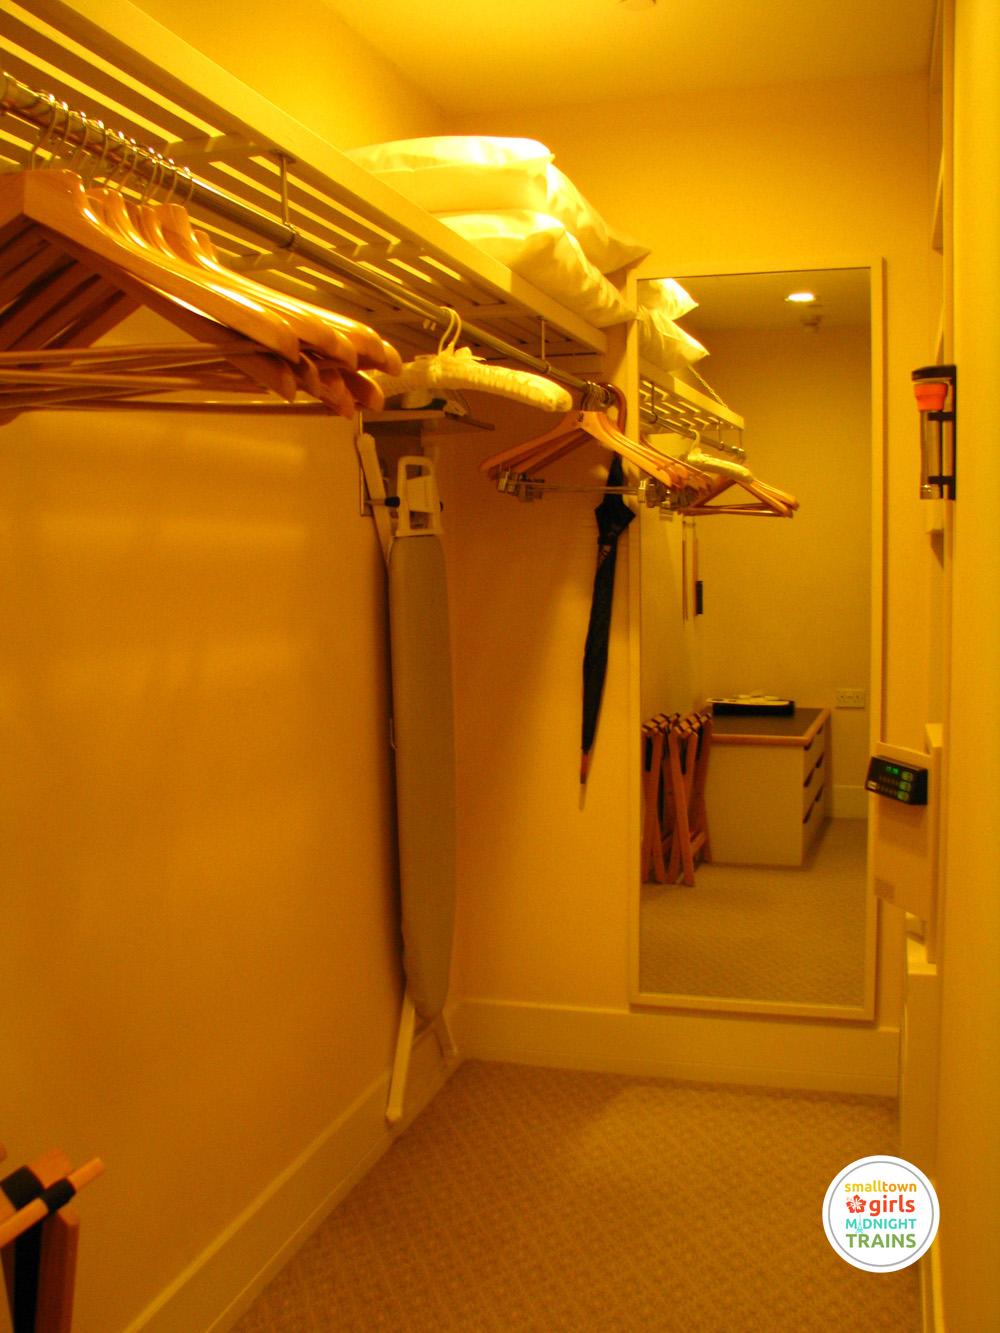 STGMT_Ritz Carlton Millenia Singapore_05_Walk In Closet